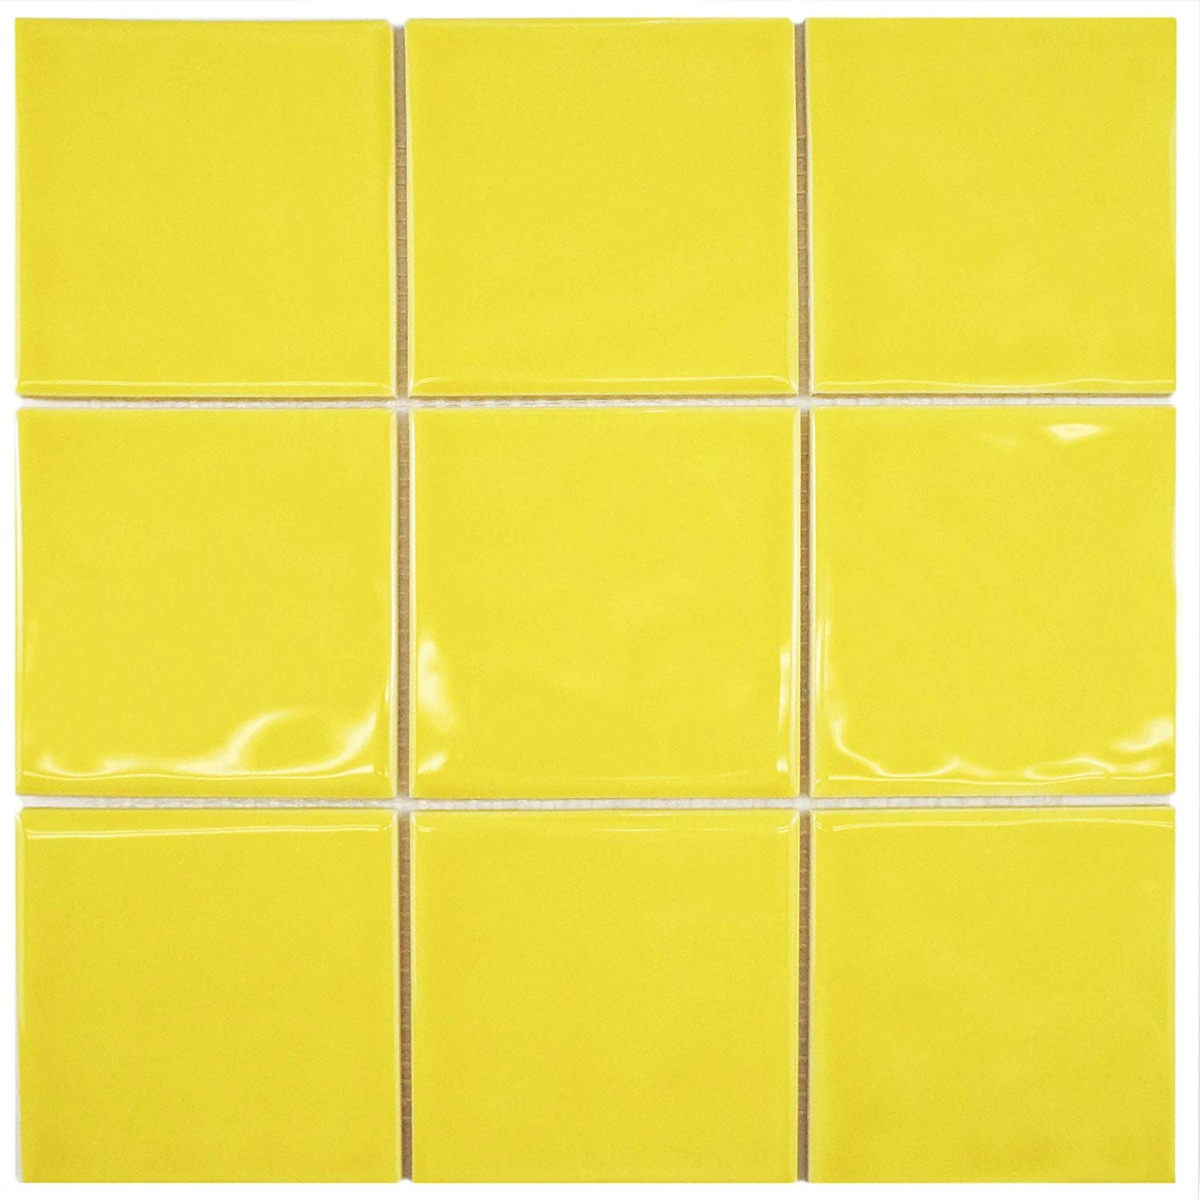 Somertile Wrc4twyl Torsio Square Ceramic Wall Tile 375 X